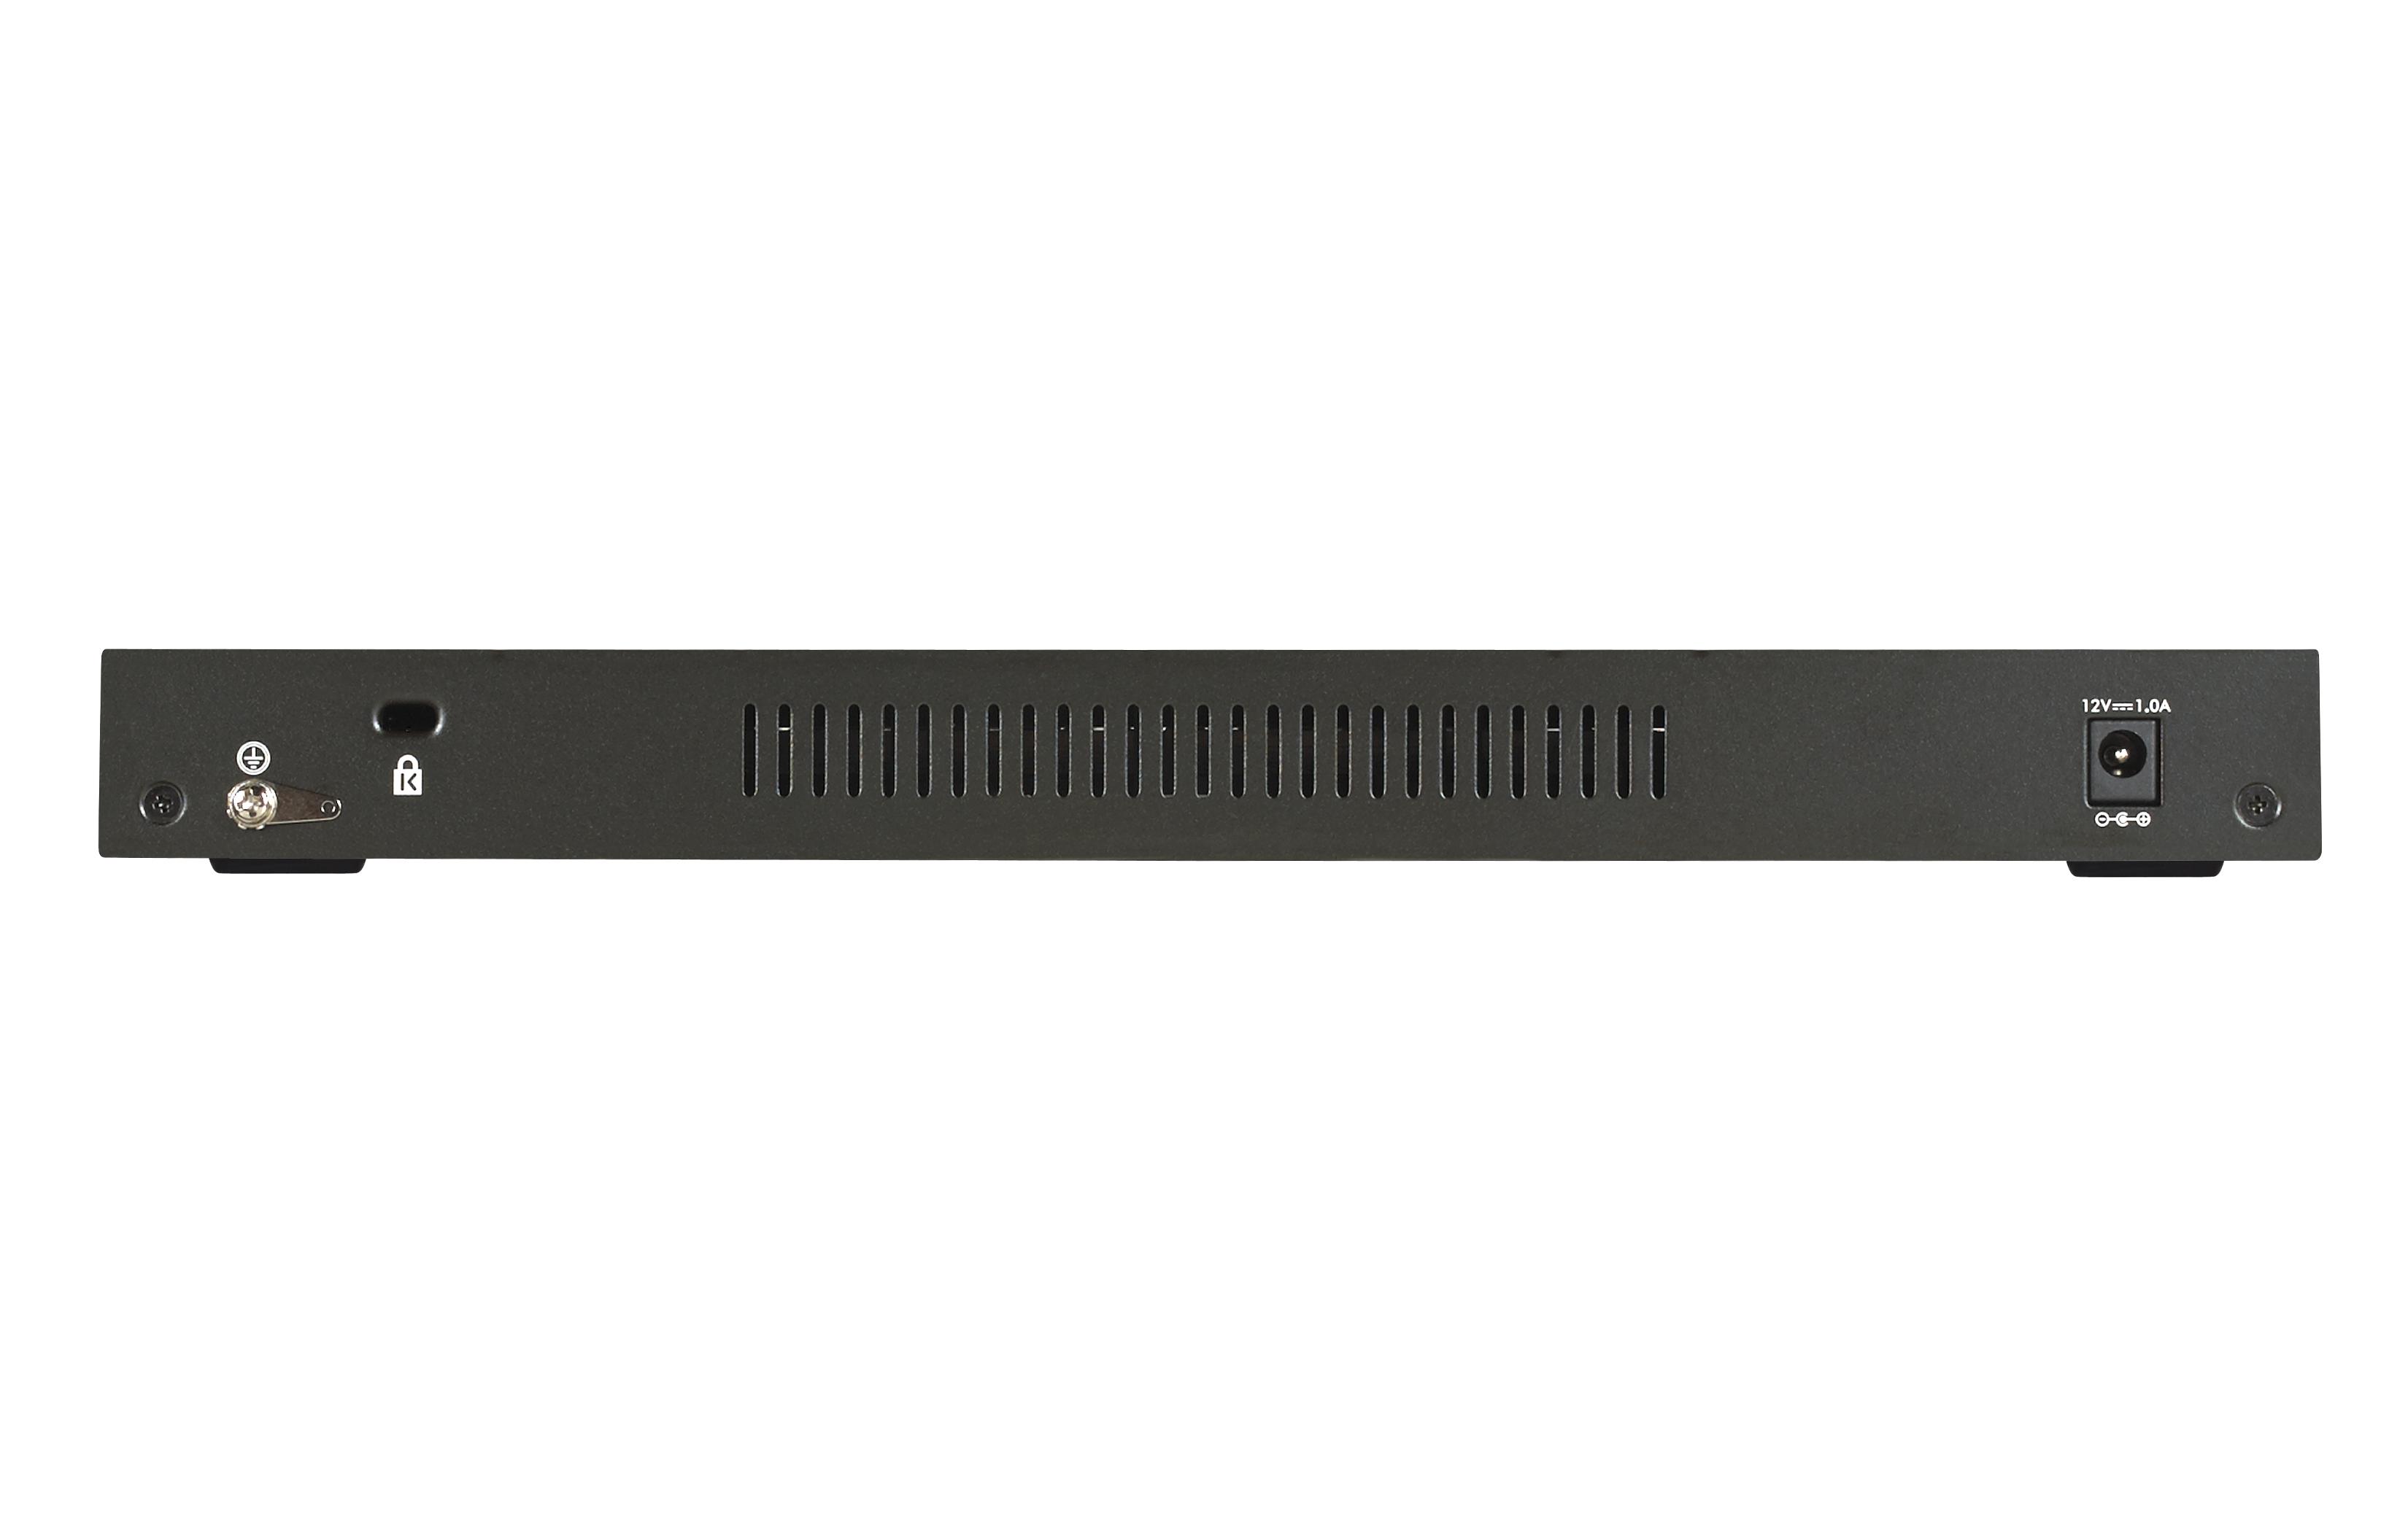 GS316-100PES Gigabit Ethernet Unmanaged Switch (16 poorten)